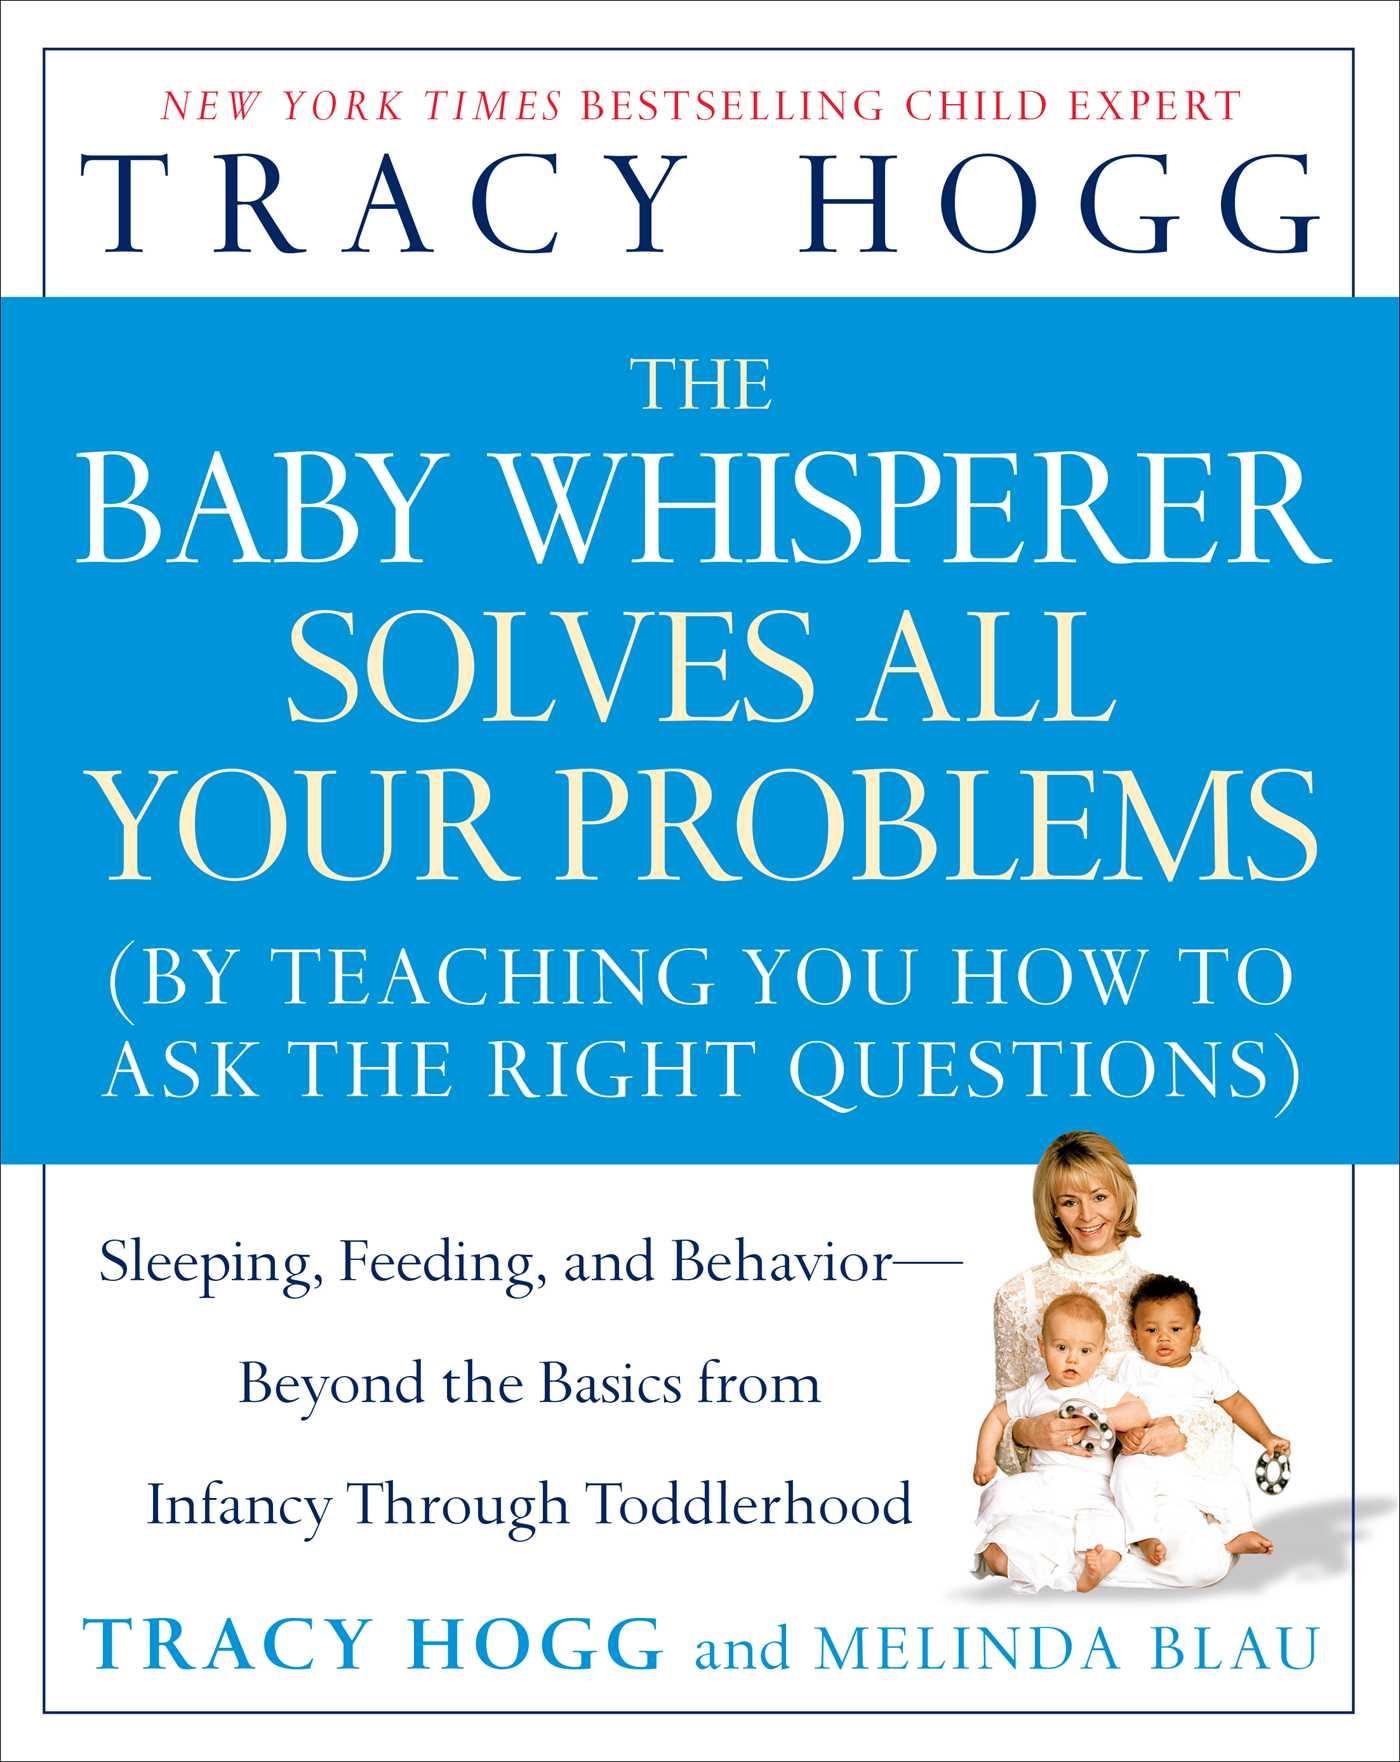 The baby whisperer solves all your problems 9781439106549 hr